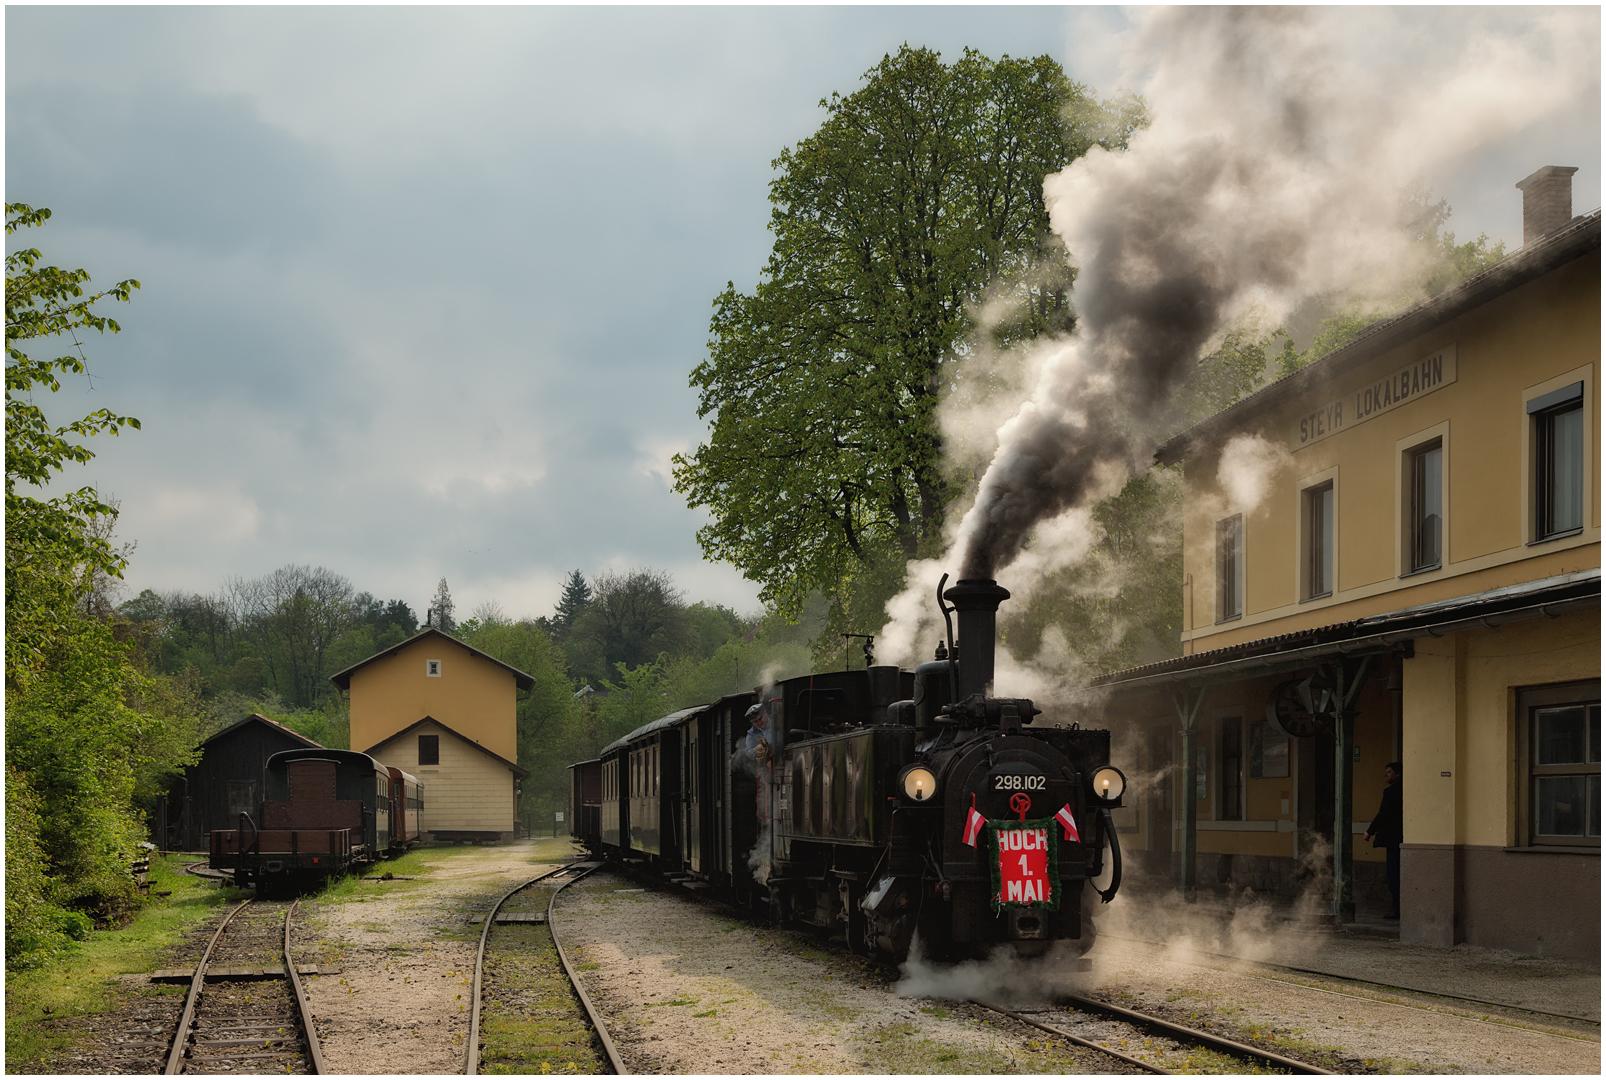 Lokalbahn IV